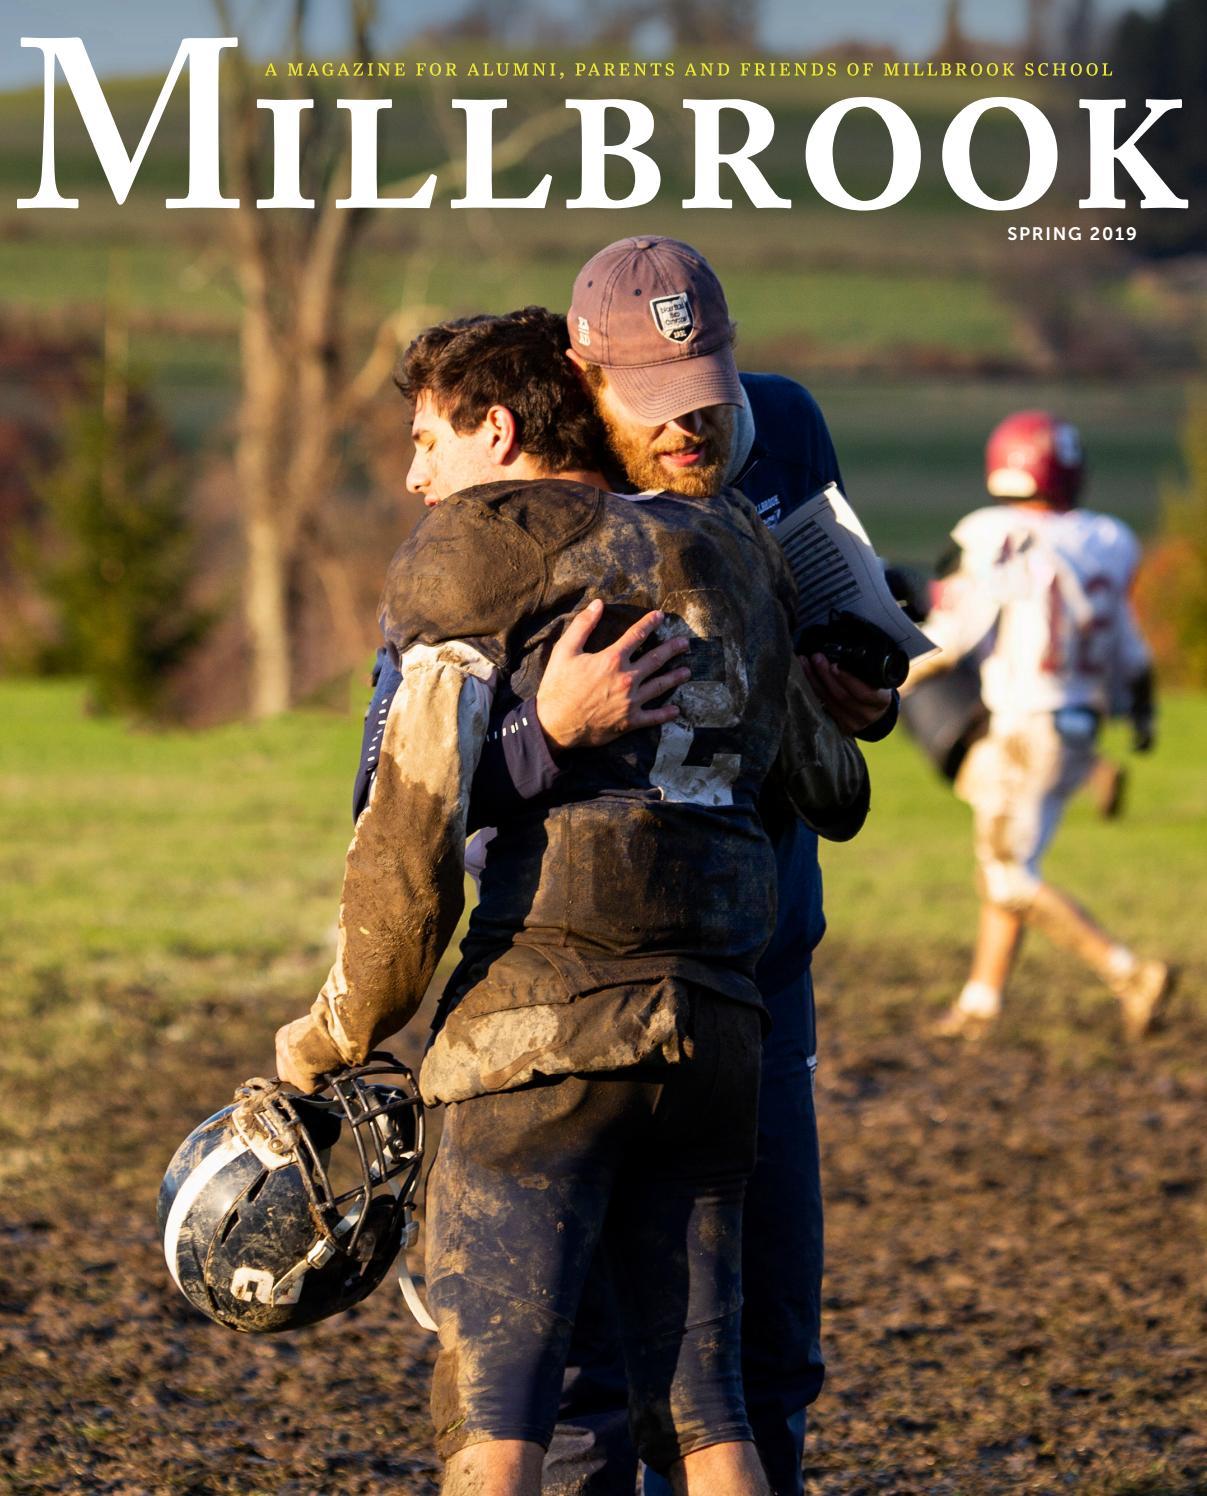 Millbrook, Spring/Summer 2019 by Millbrook School - issuu